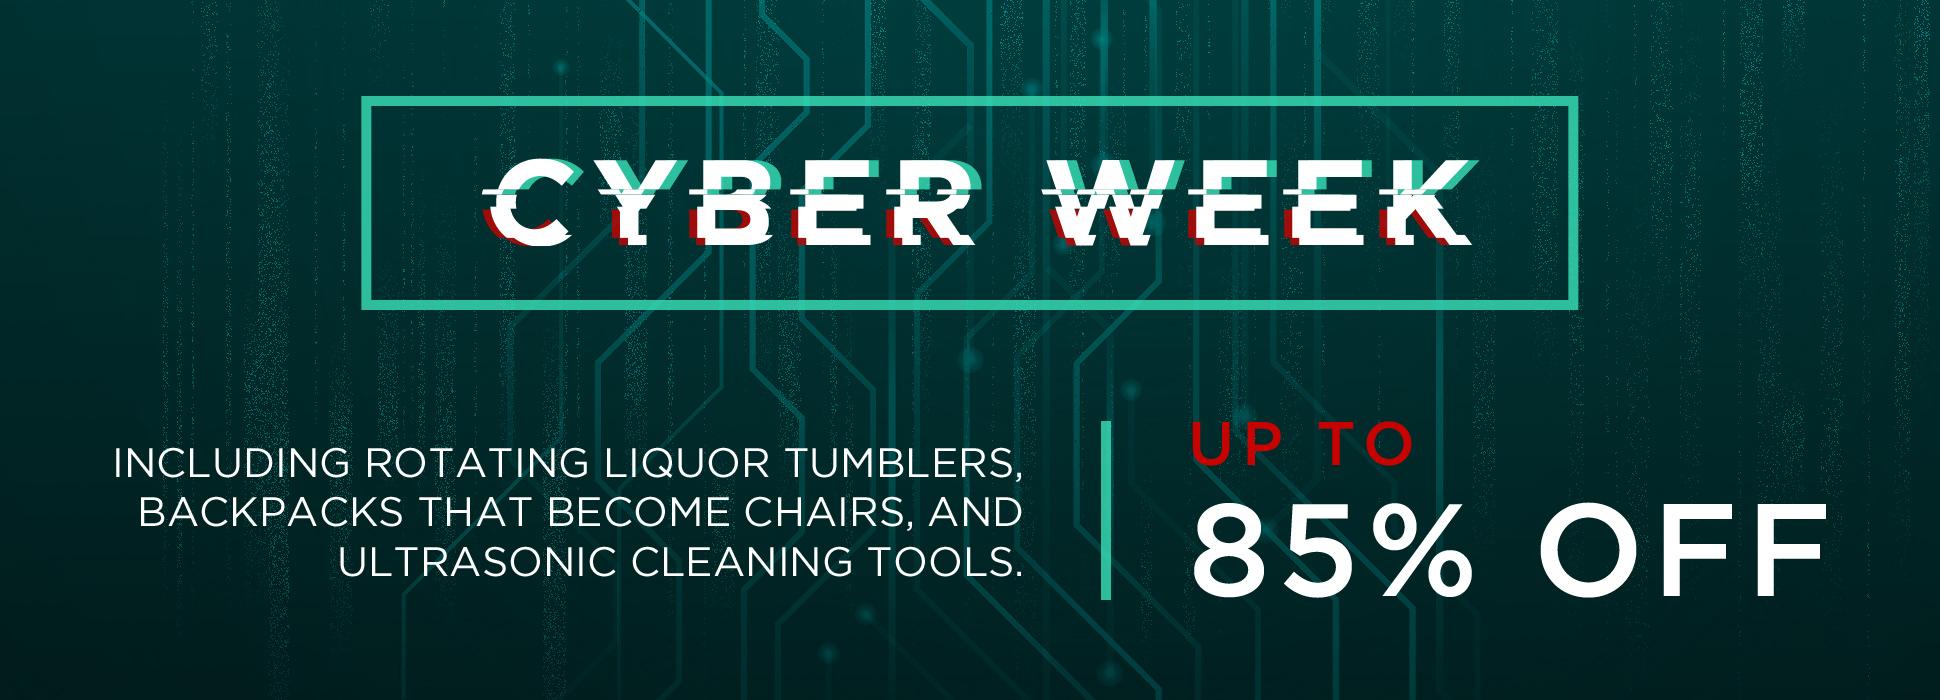 Cyber Week Day 5 (Web Banner)